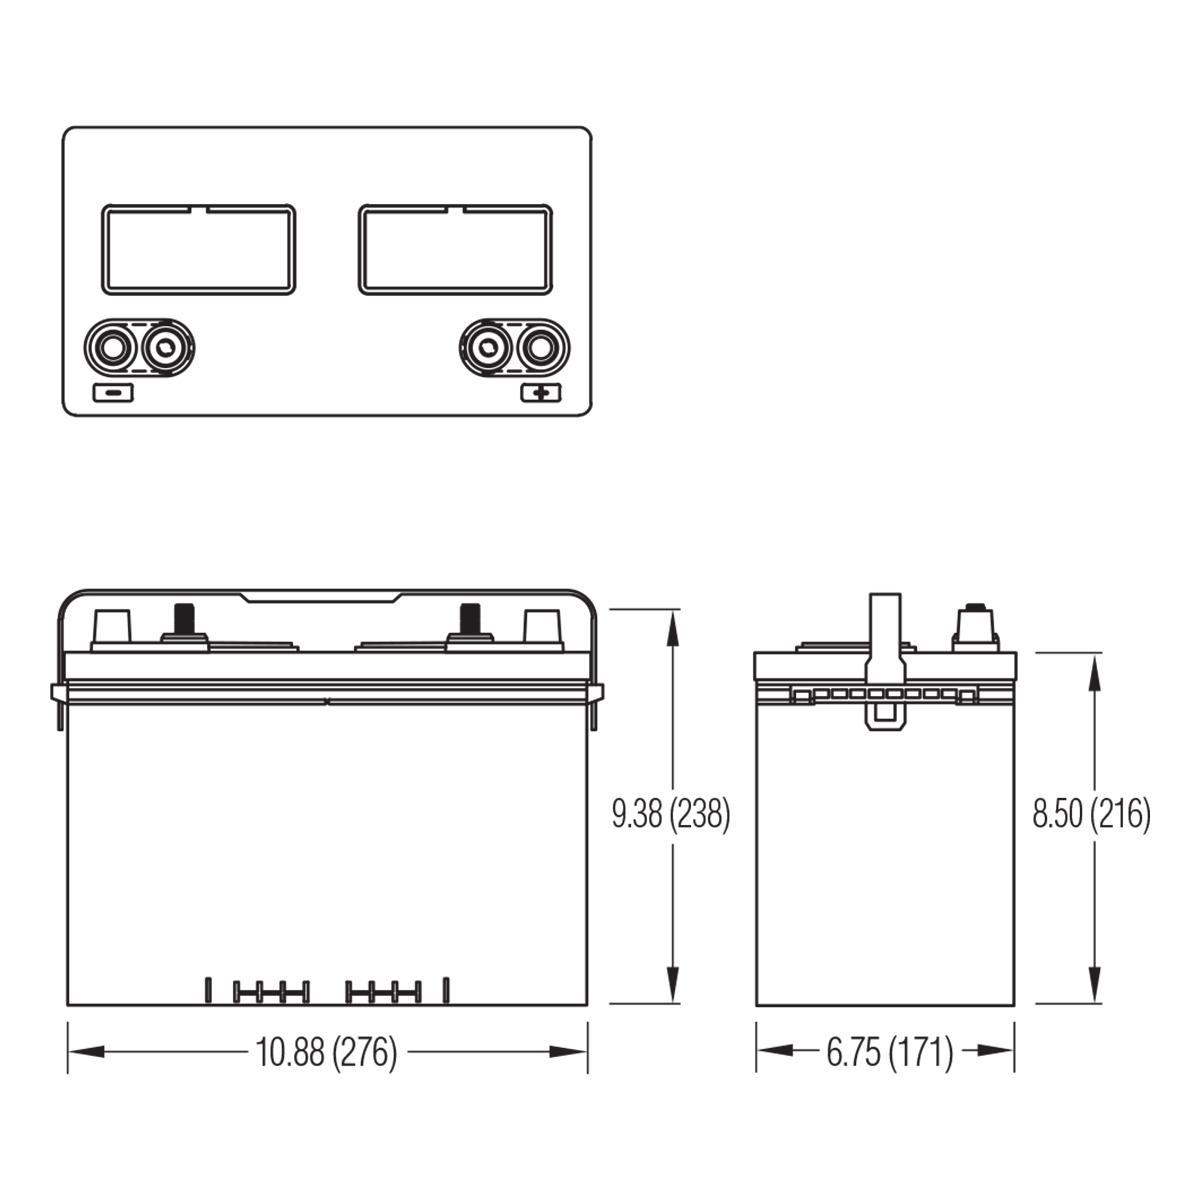 24dc95 crown 12v 95ah deep cycle battery. Black Bedroom Furniture Sets. Home Design Ideas